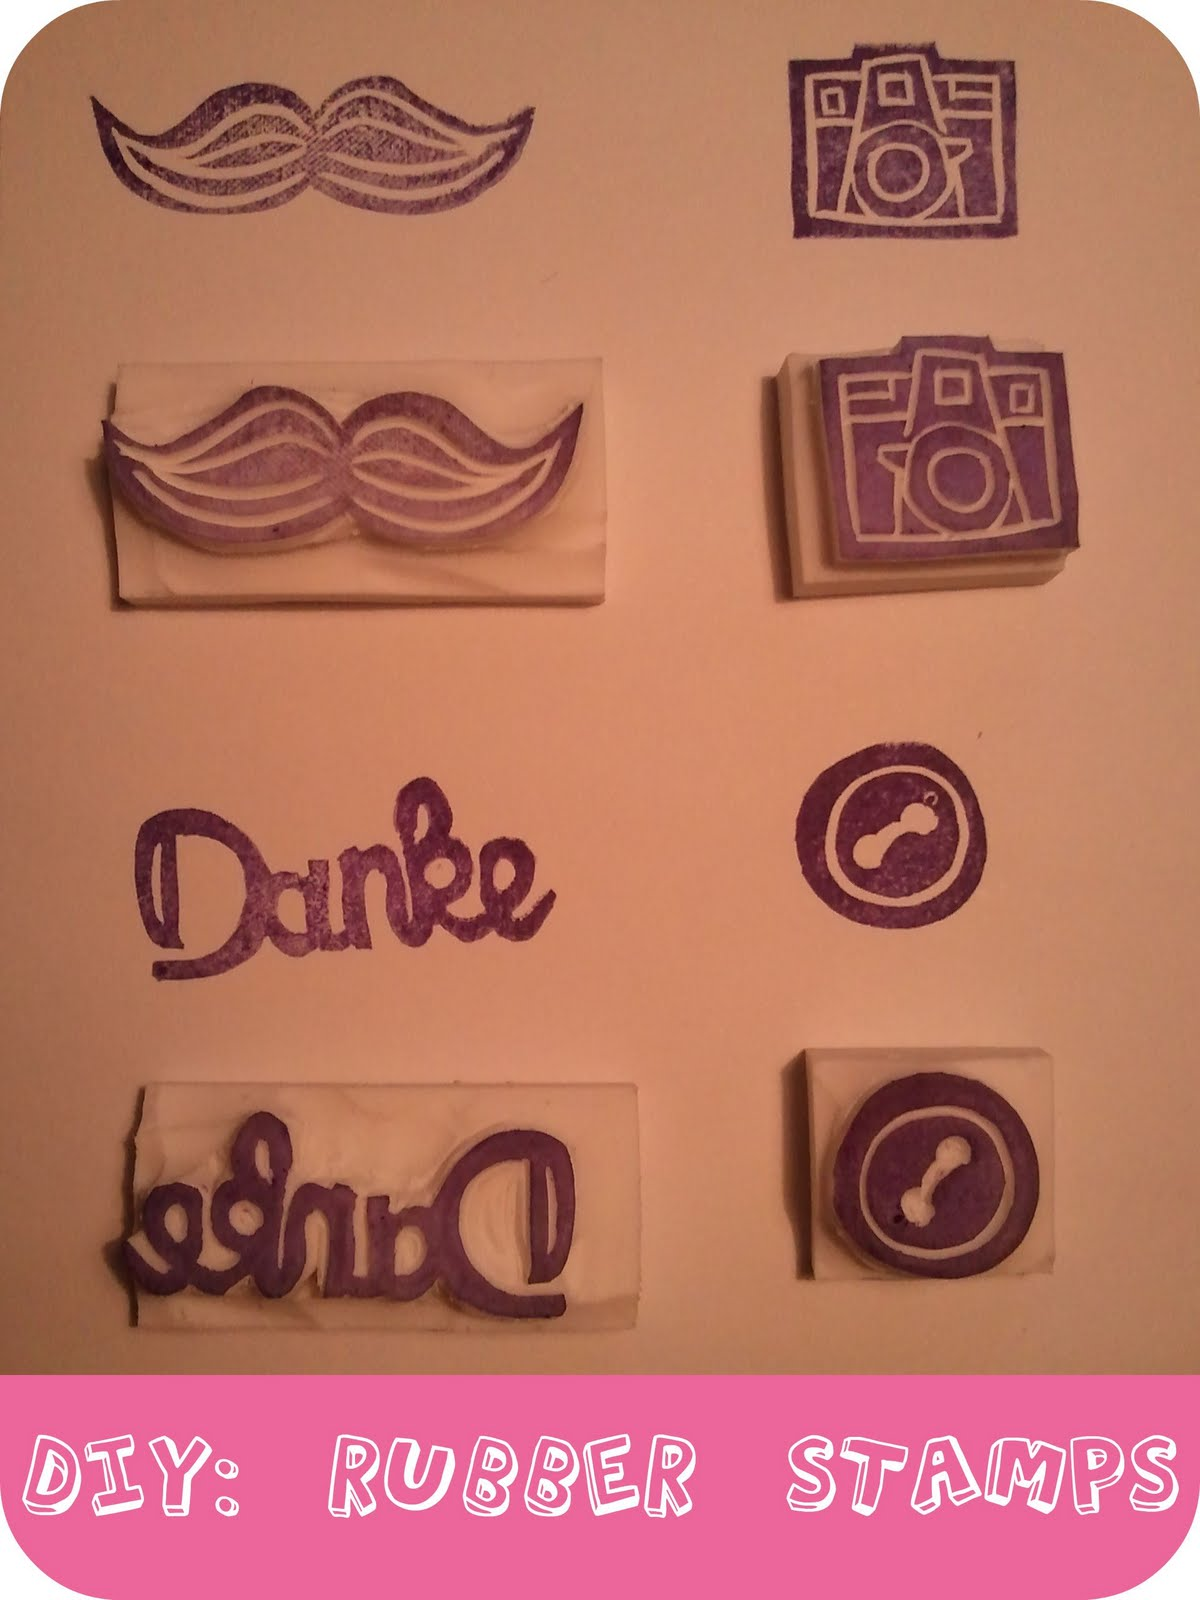 DIY: Rubber stamps. - Luloveshandmade